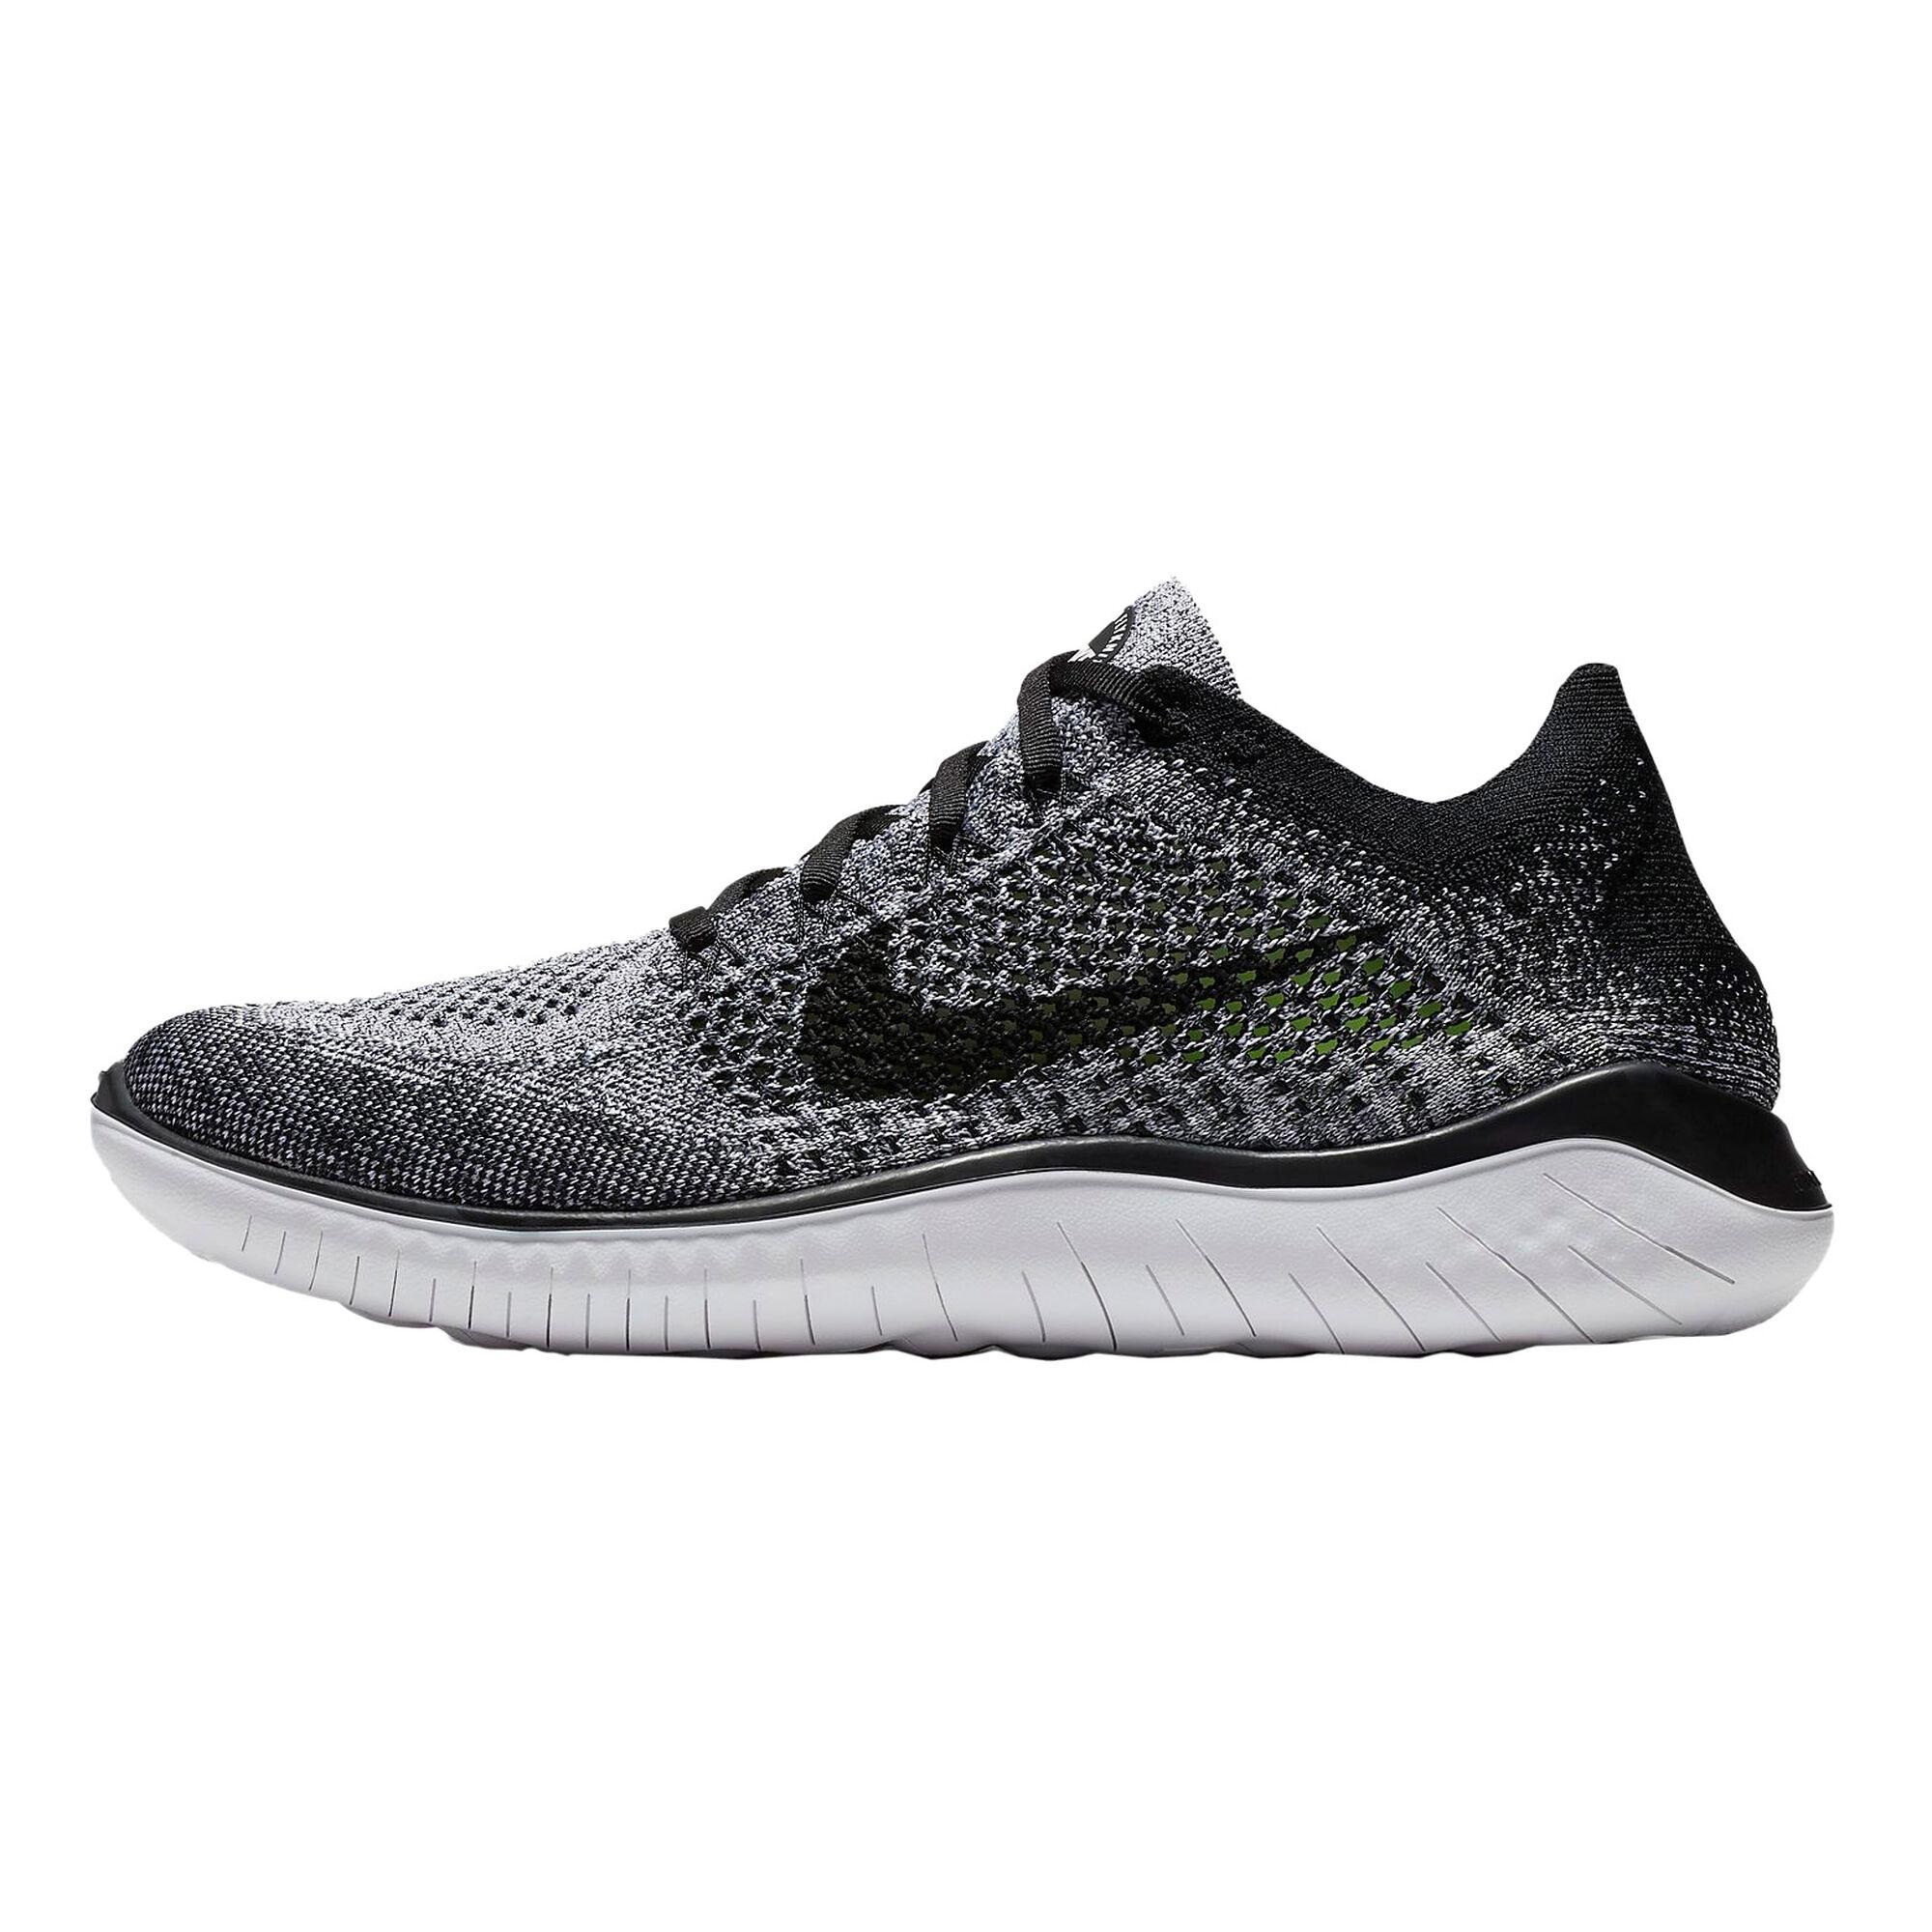 27302ae37b03a Nike · Nike · Nike · Nike · Nike · Nike · Nike · Nike. Free Run Flyknit 2018  ...